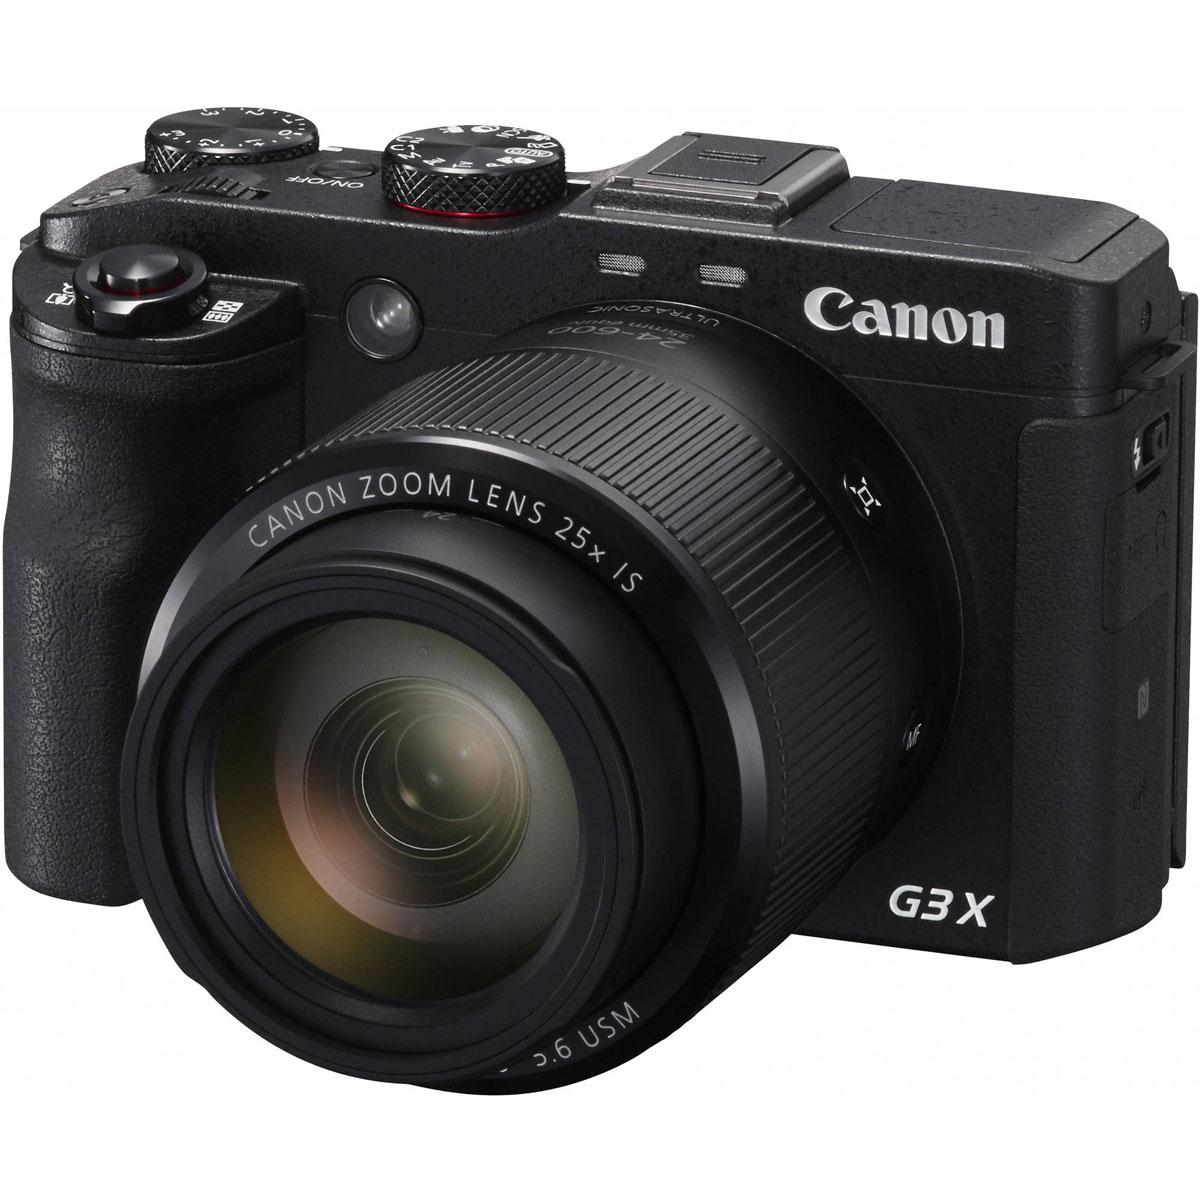 Canon PowerShot G3 X, Black цифровая фотокамера зарядное устройство для фотоаппарата canon powershot